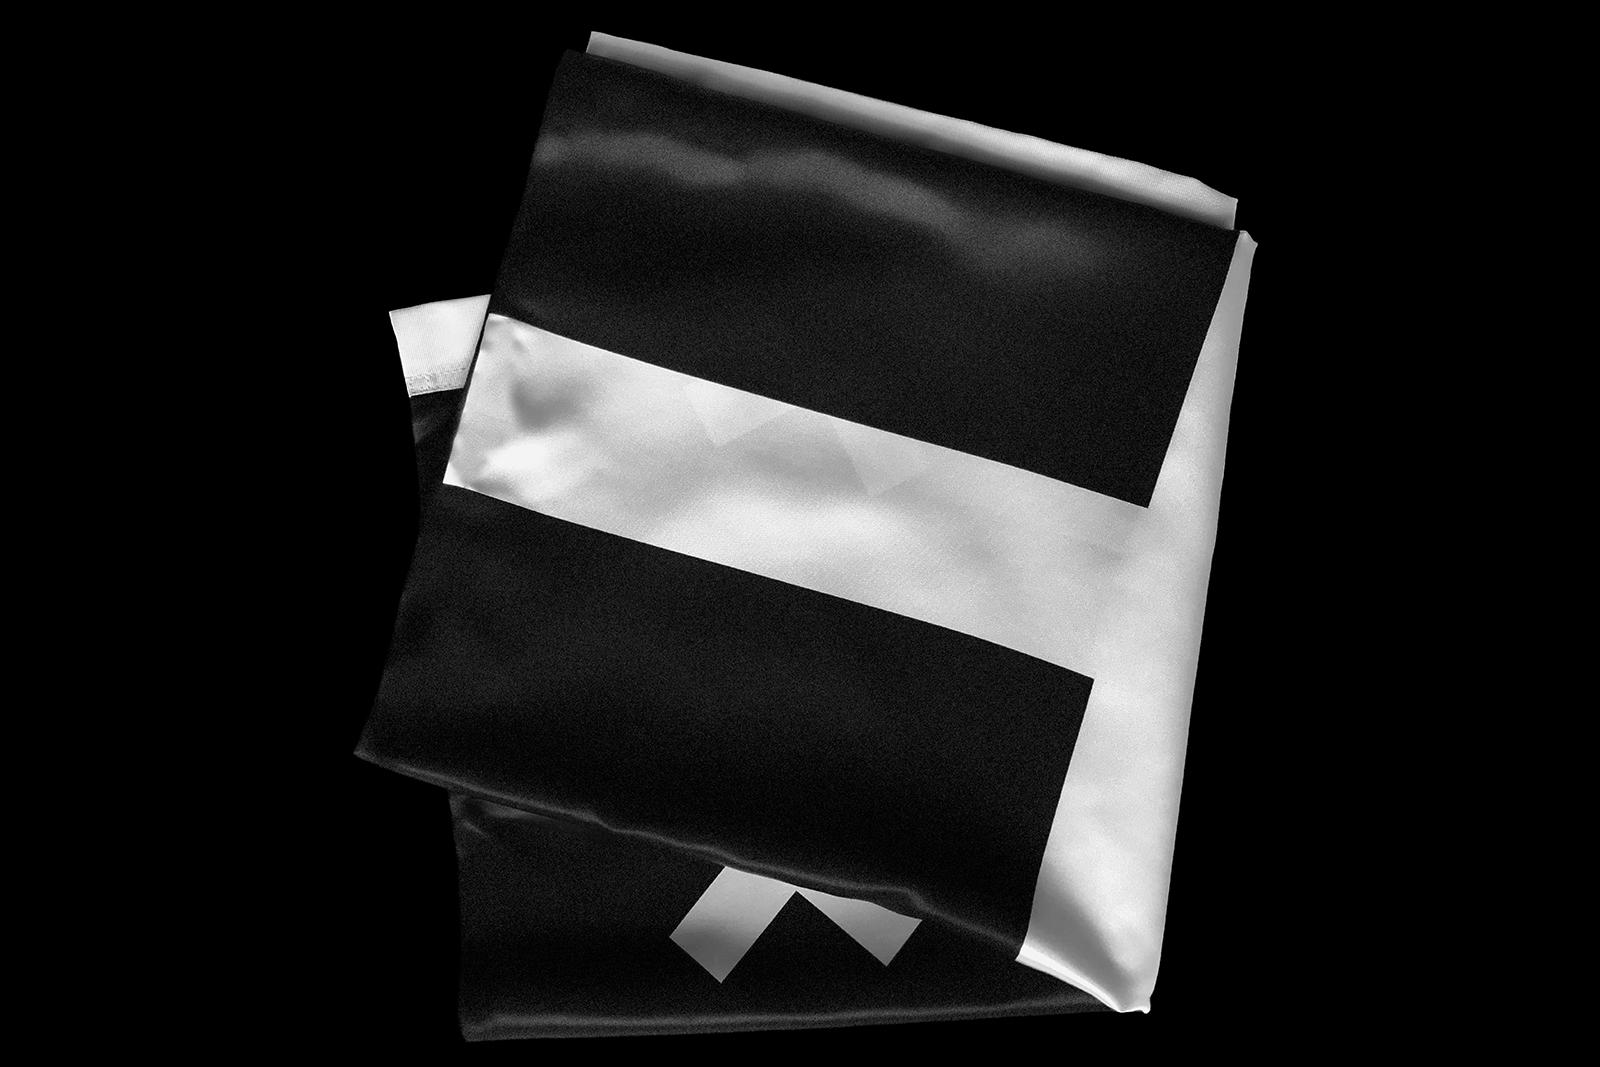 melbourne_flag_design_megmclennan_2.jpg